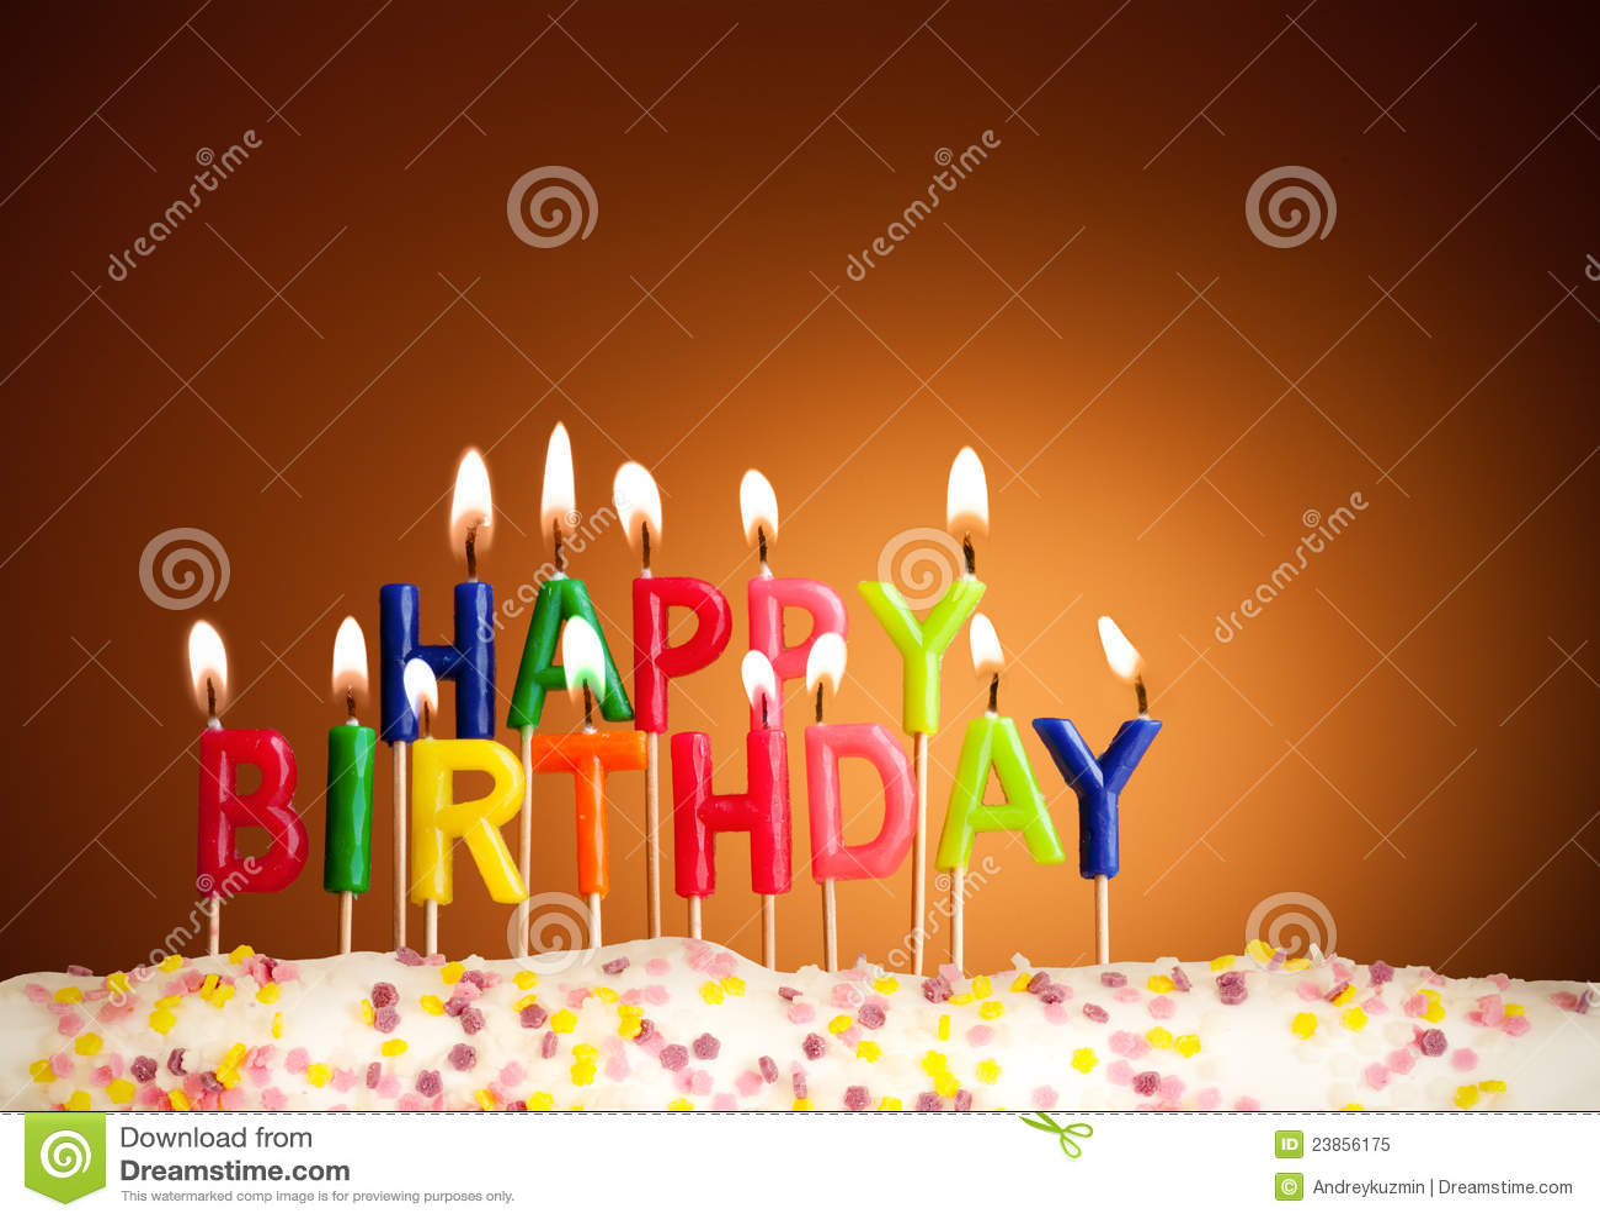 Happy Birthday Lit Candles Closeup Royalty Free Stock